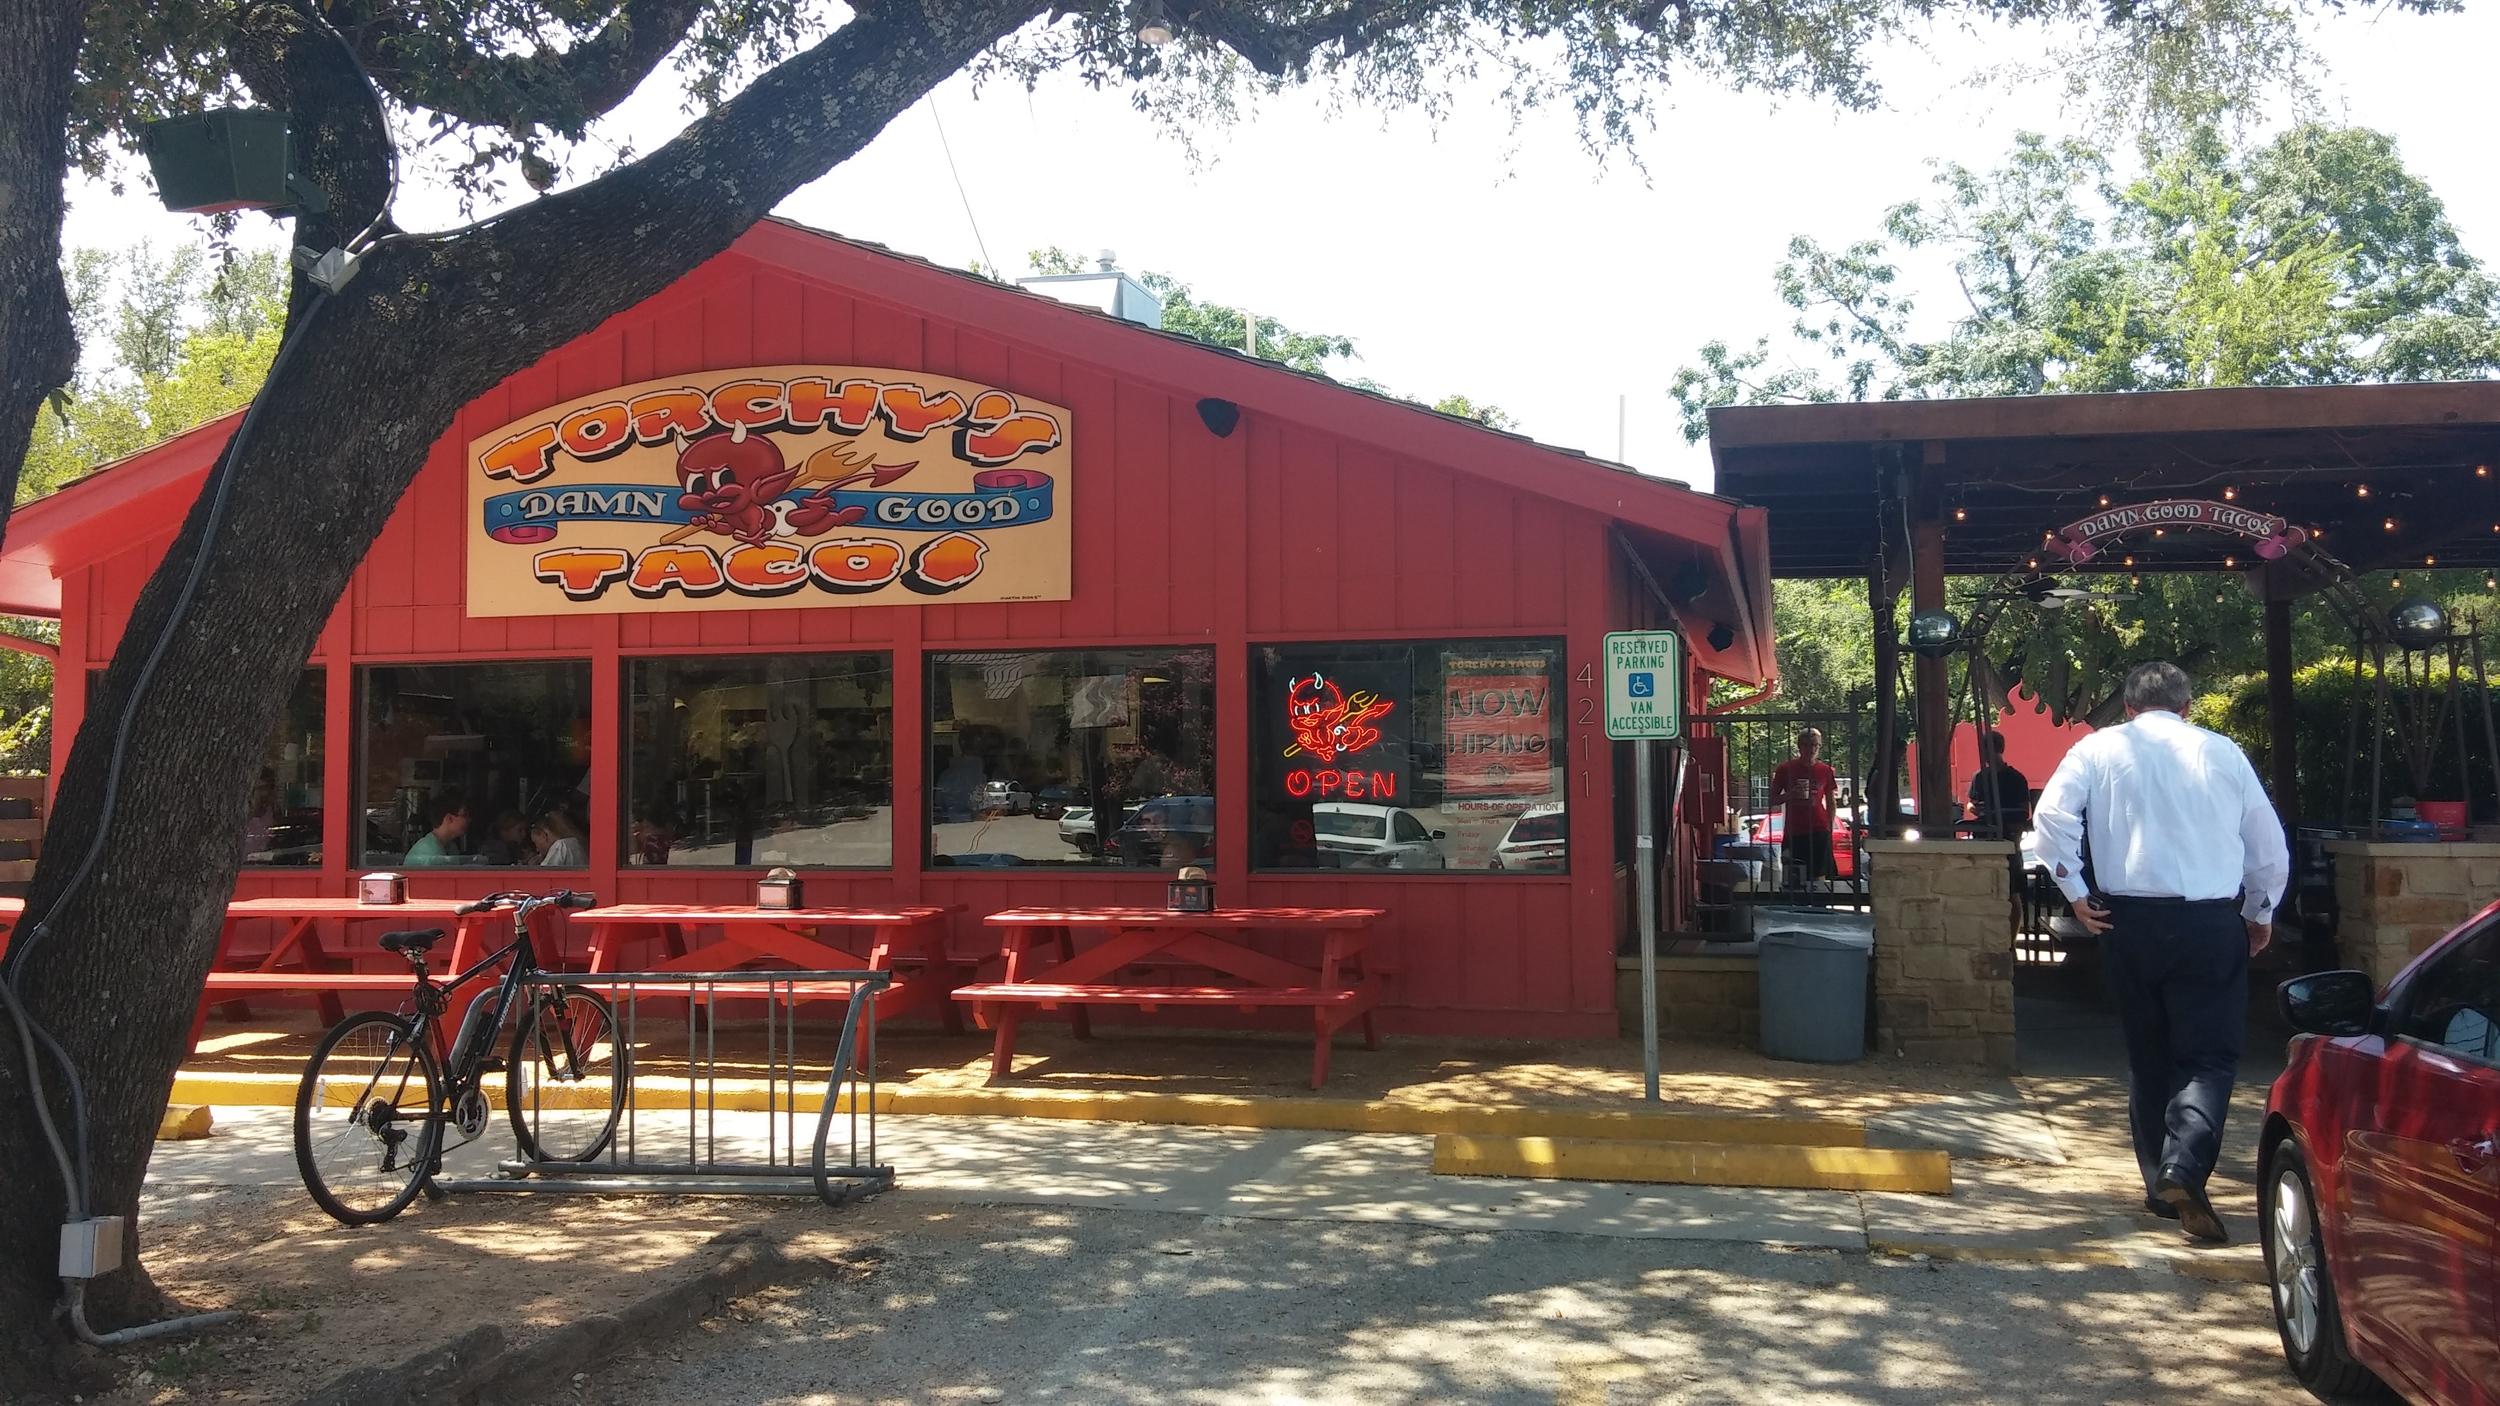 2014-08-11 Austin TX with Greg Scott at Westin (2).jpg